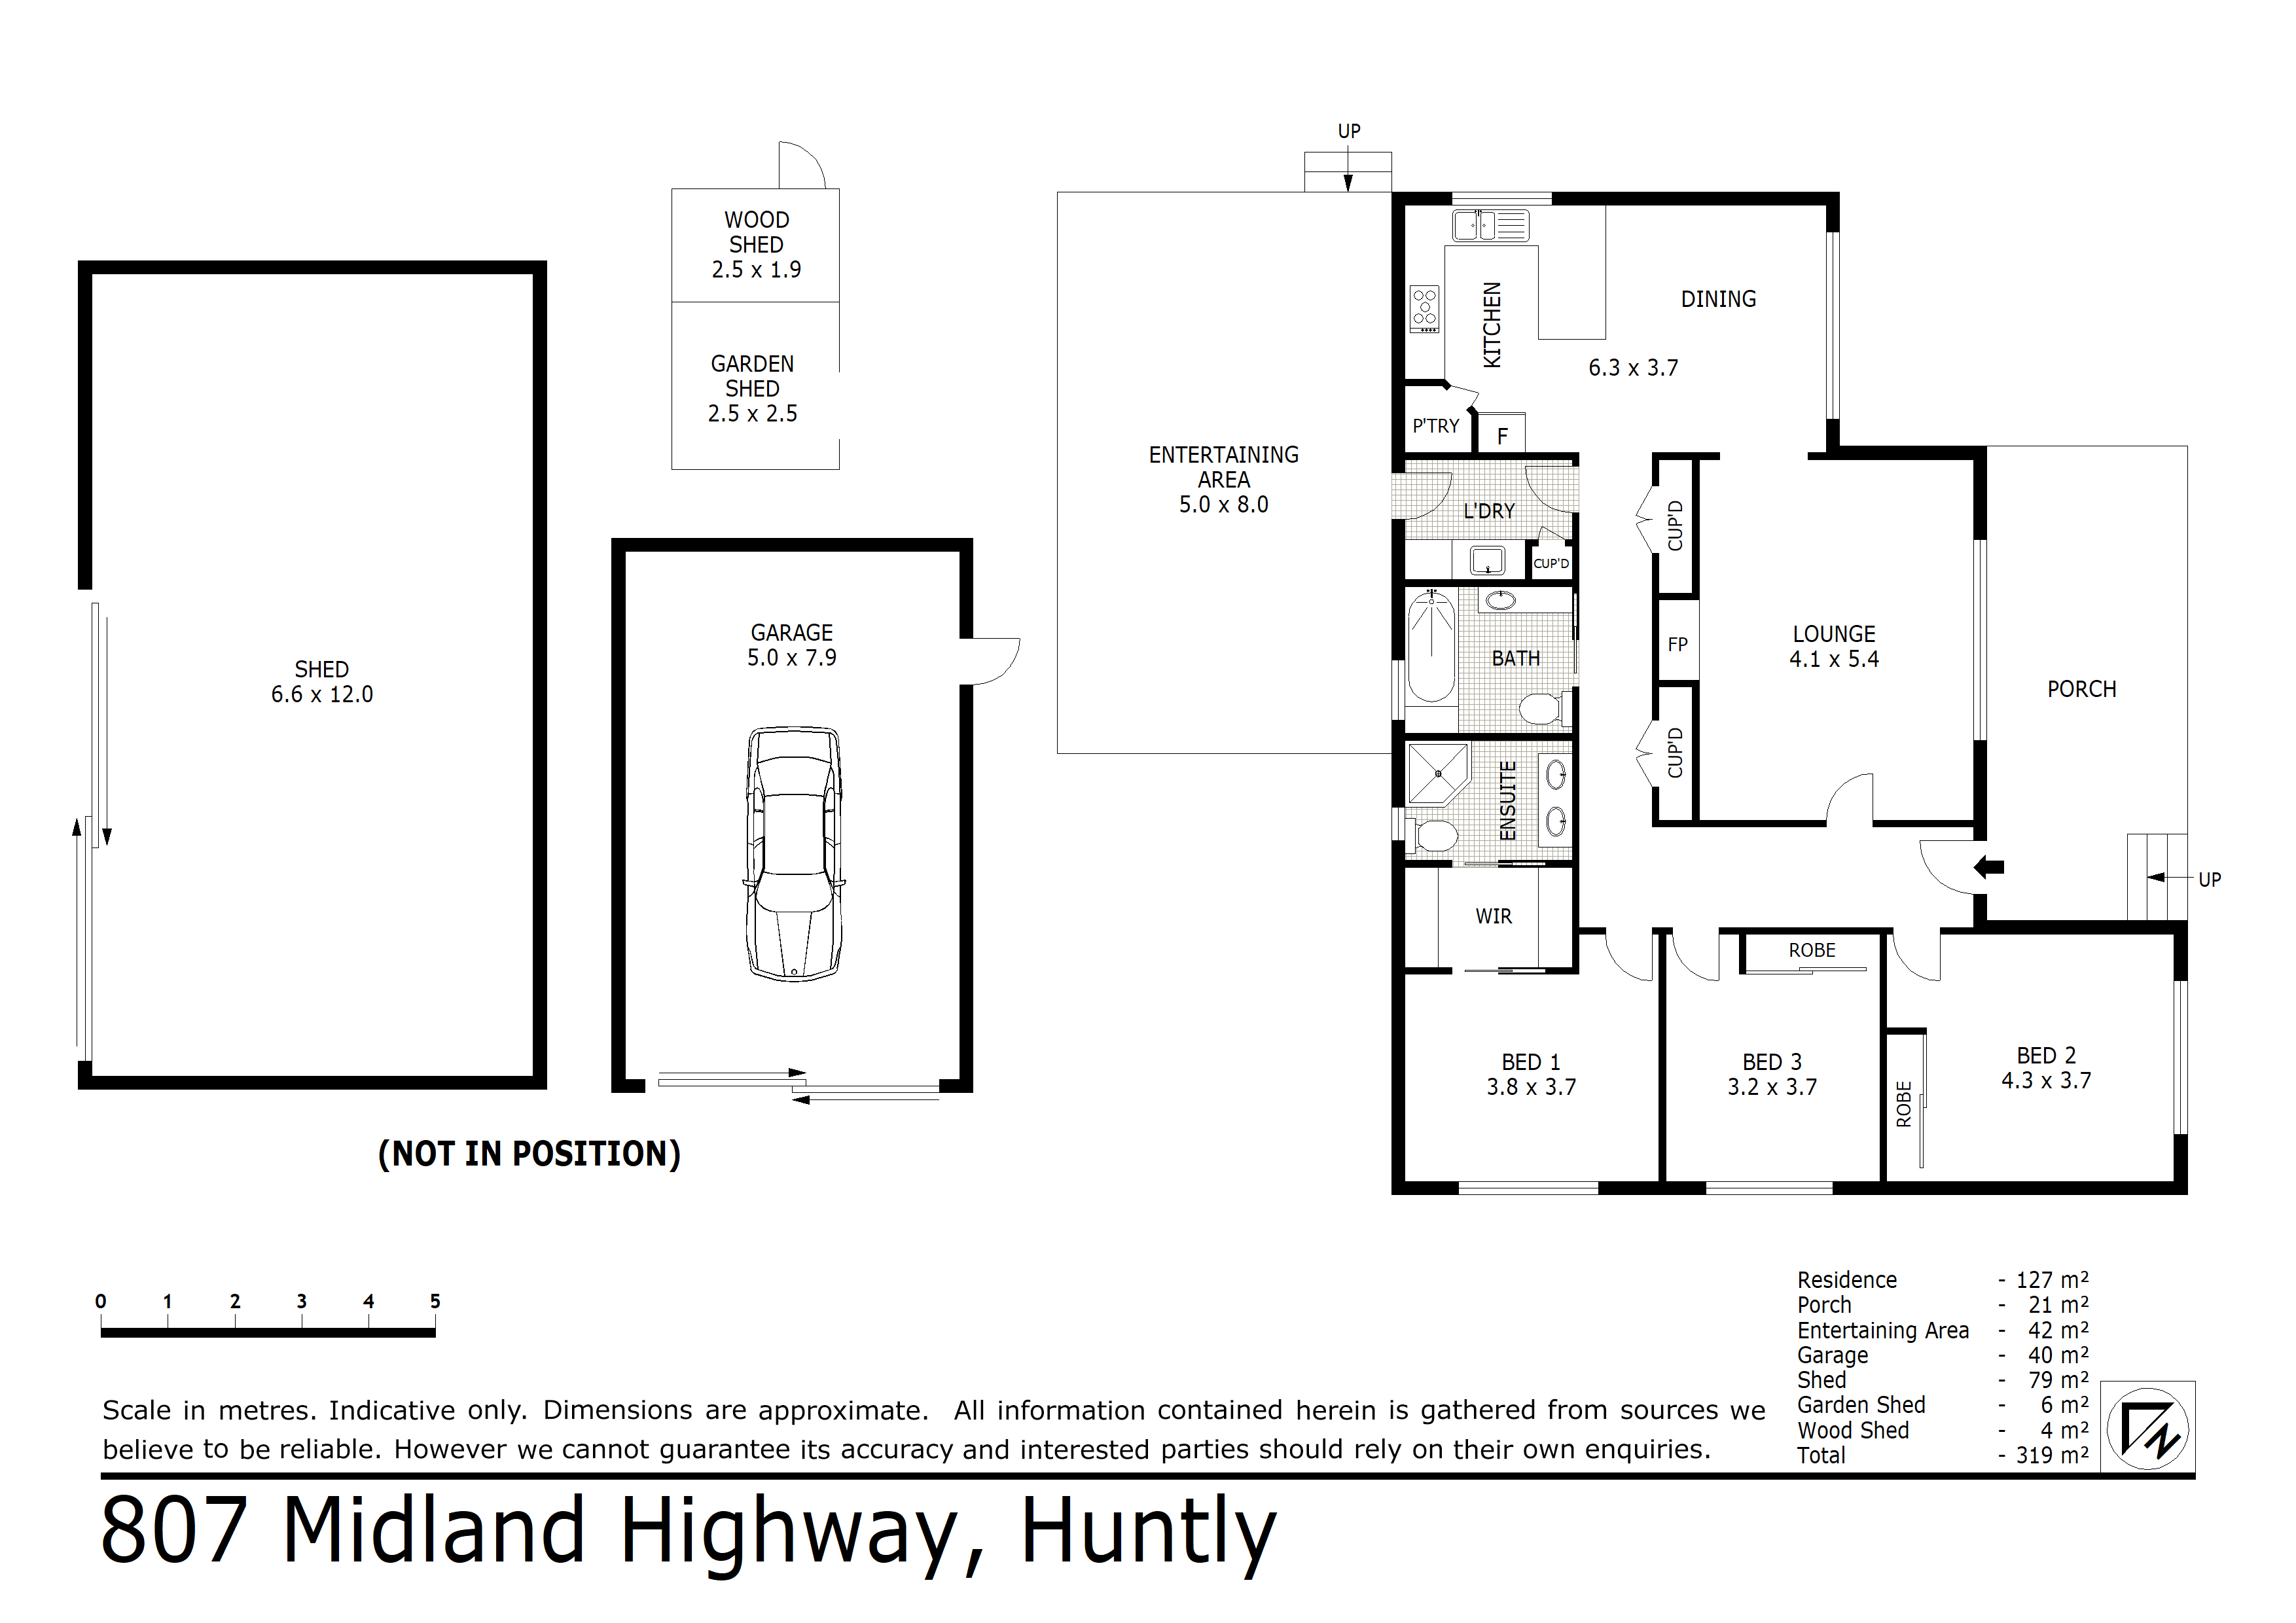 807 Midland Highway, Huntly, VIC 3551